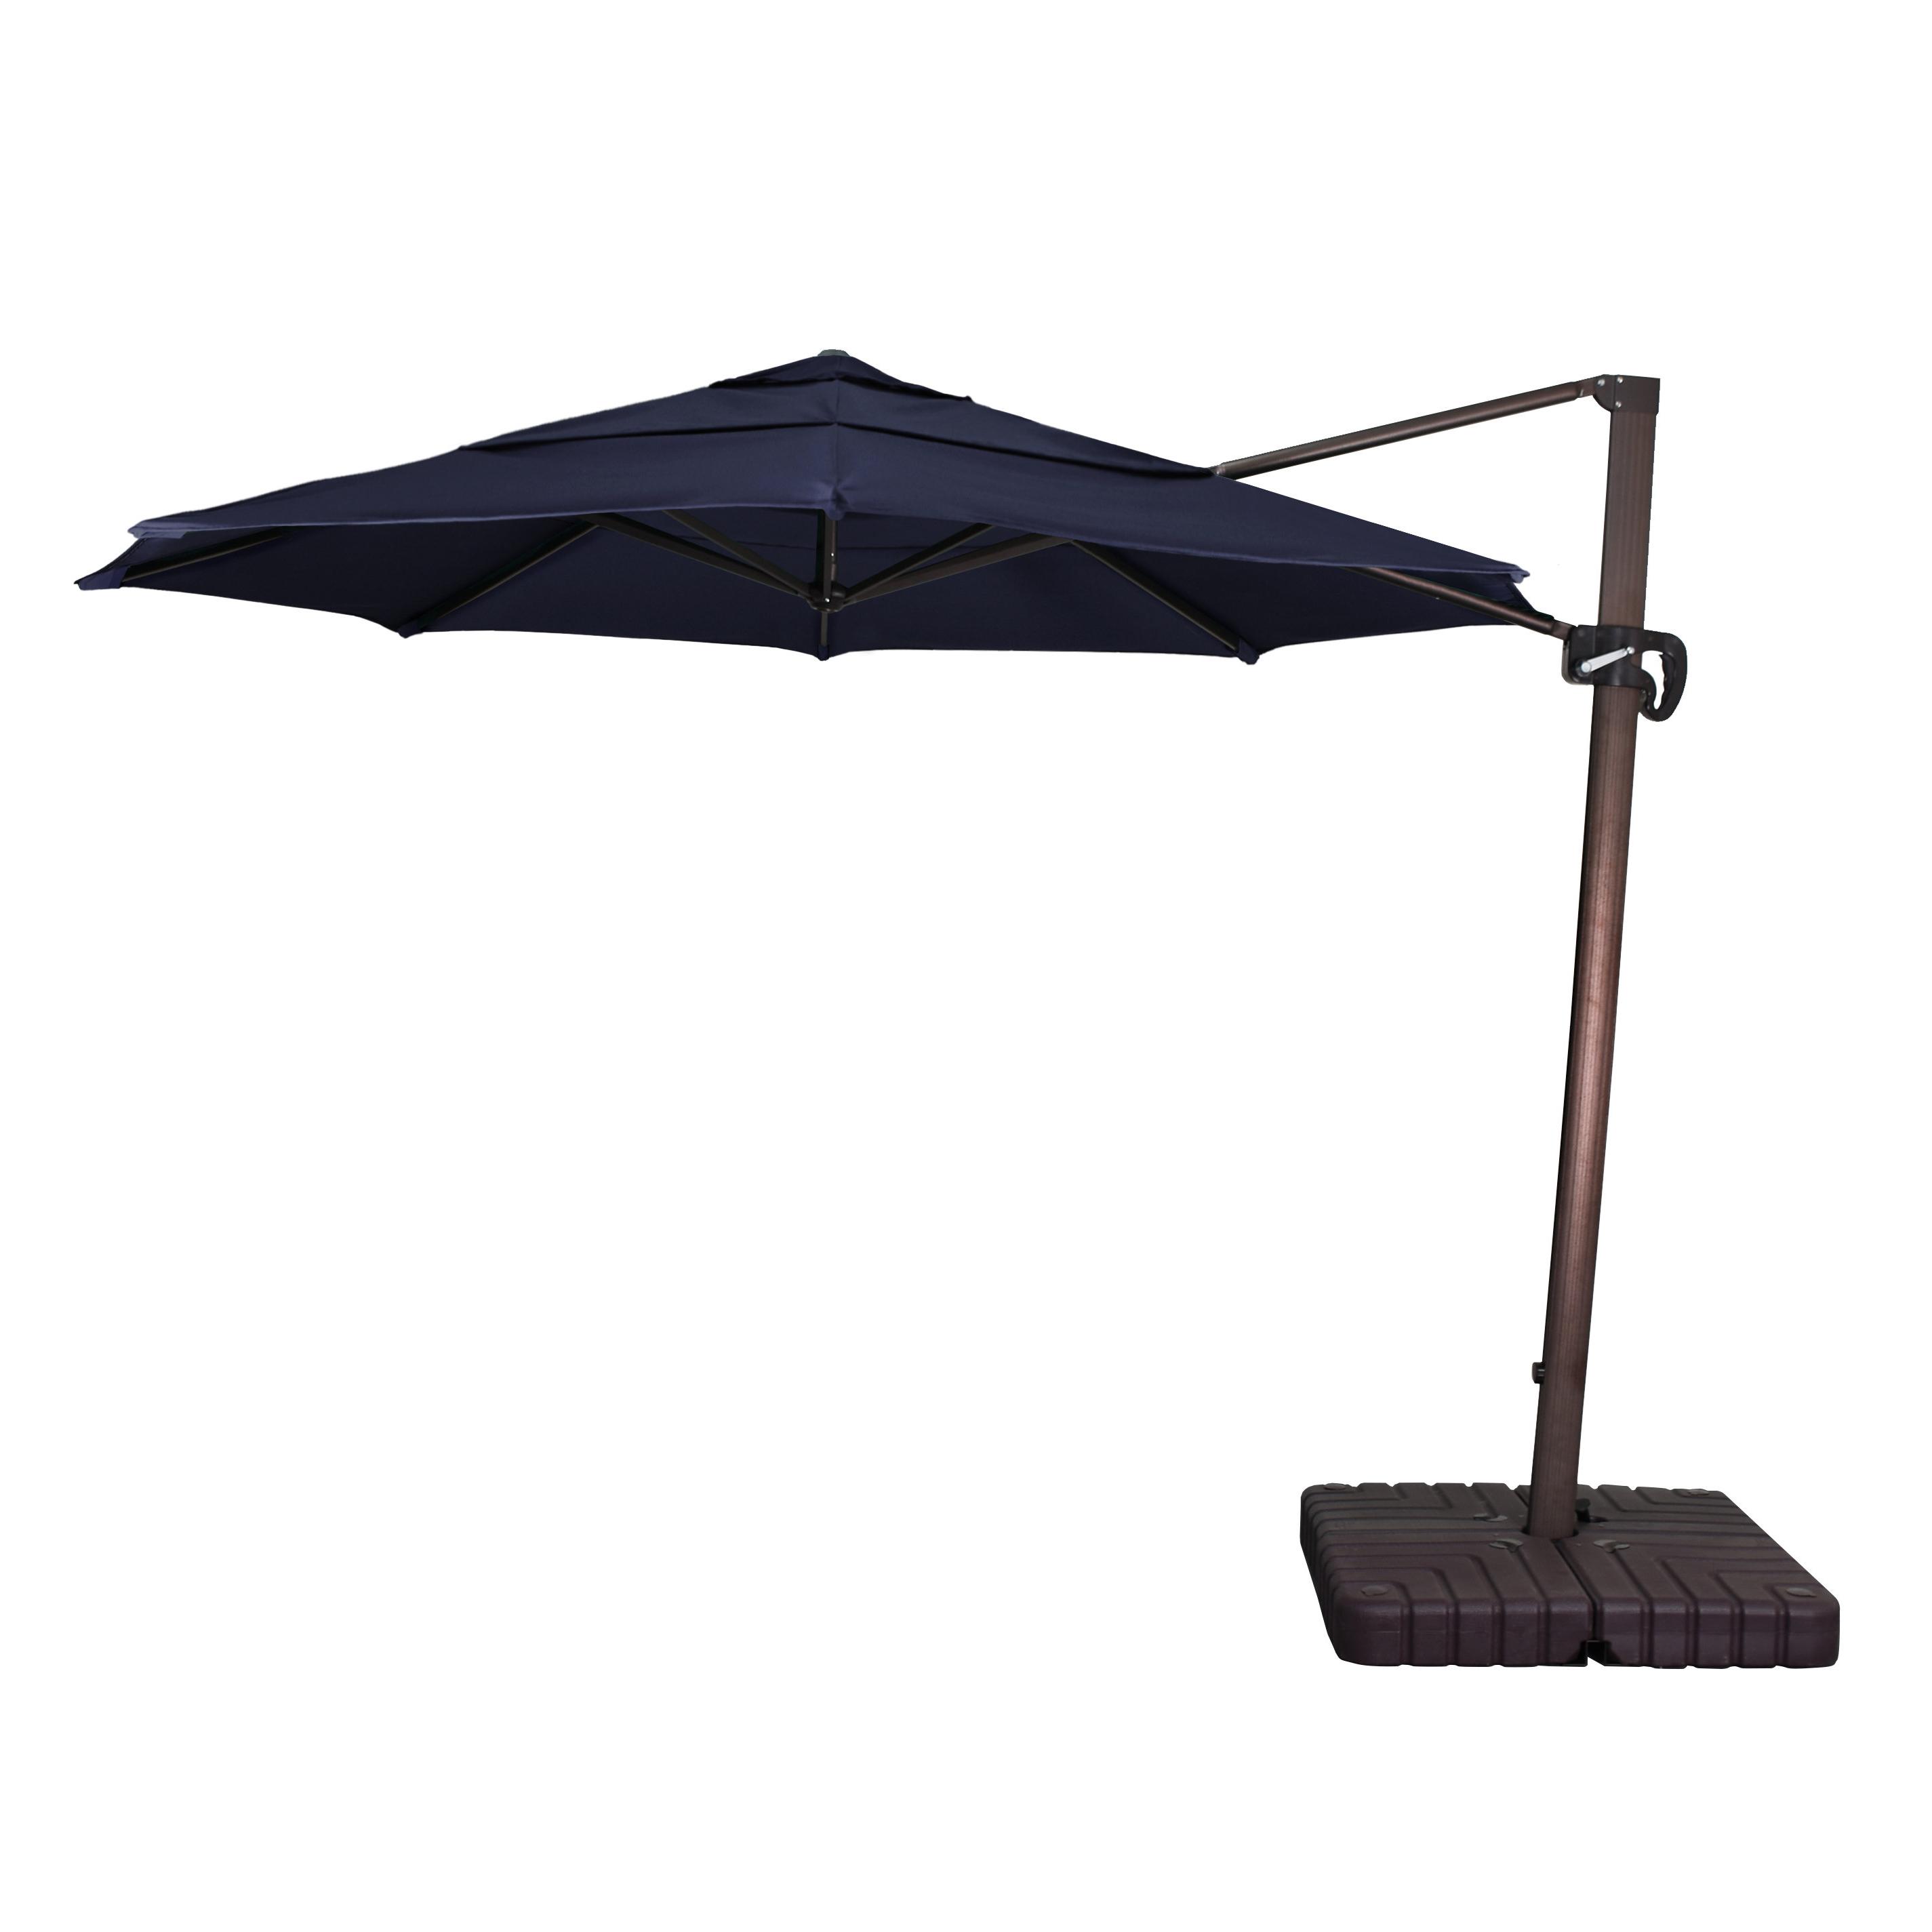 Carlisle 11' Cantilever Sunbrella Umbrella Within Widely Used Krystal Square Cantilever Sunbrella Umbrellas (View 12 of 20)